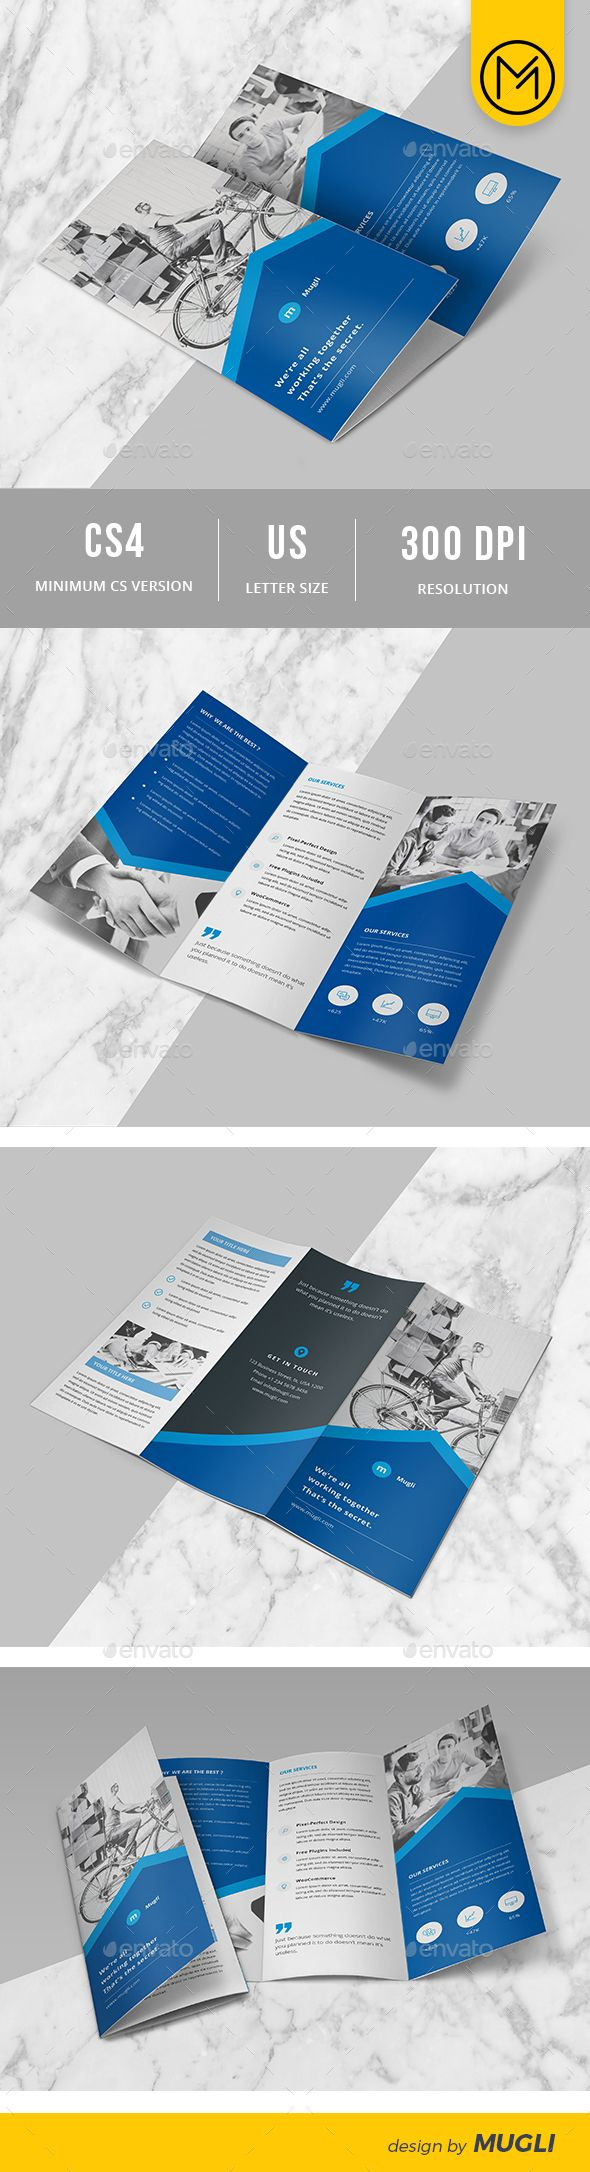 Trifold Brochure | Tríptico